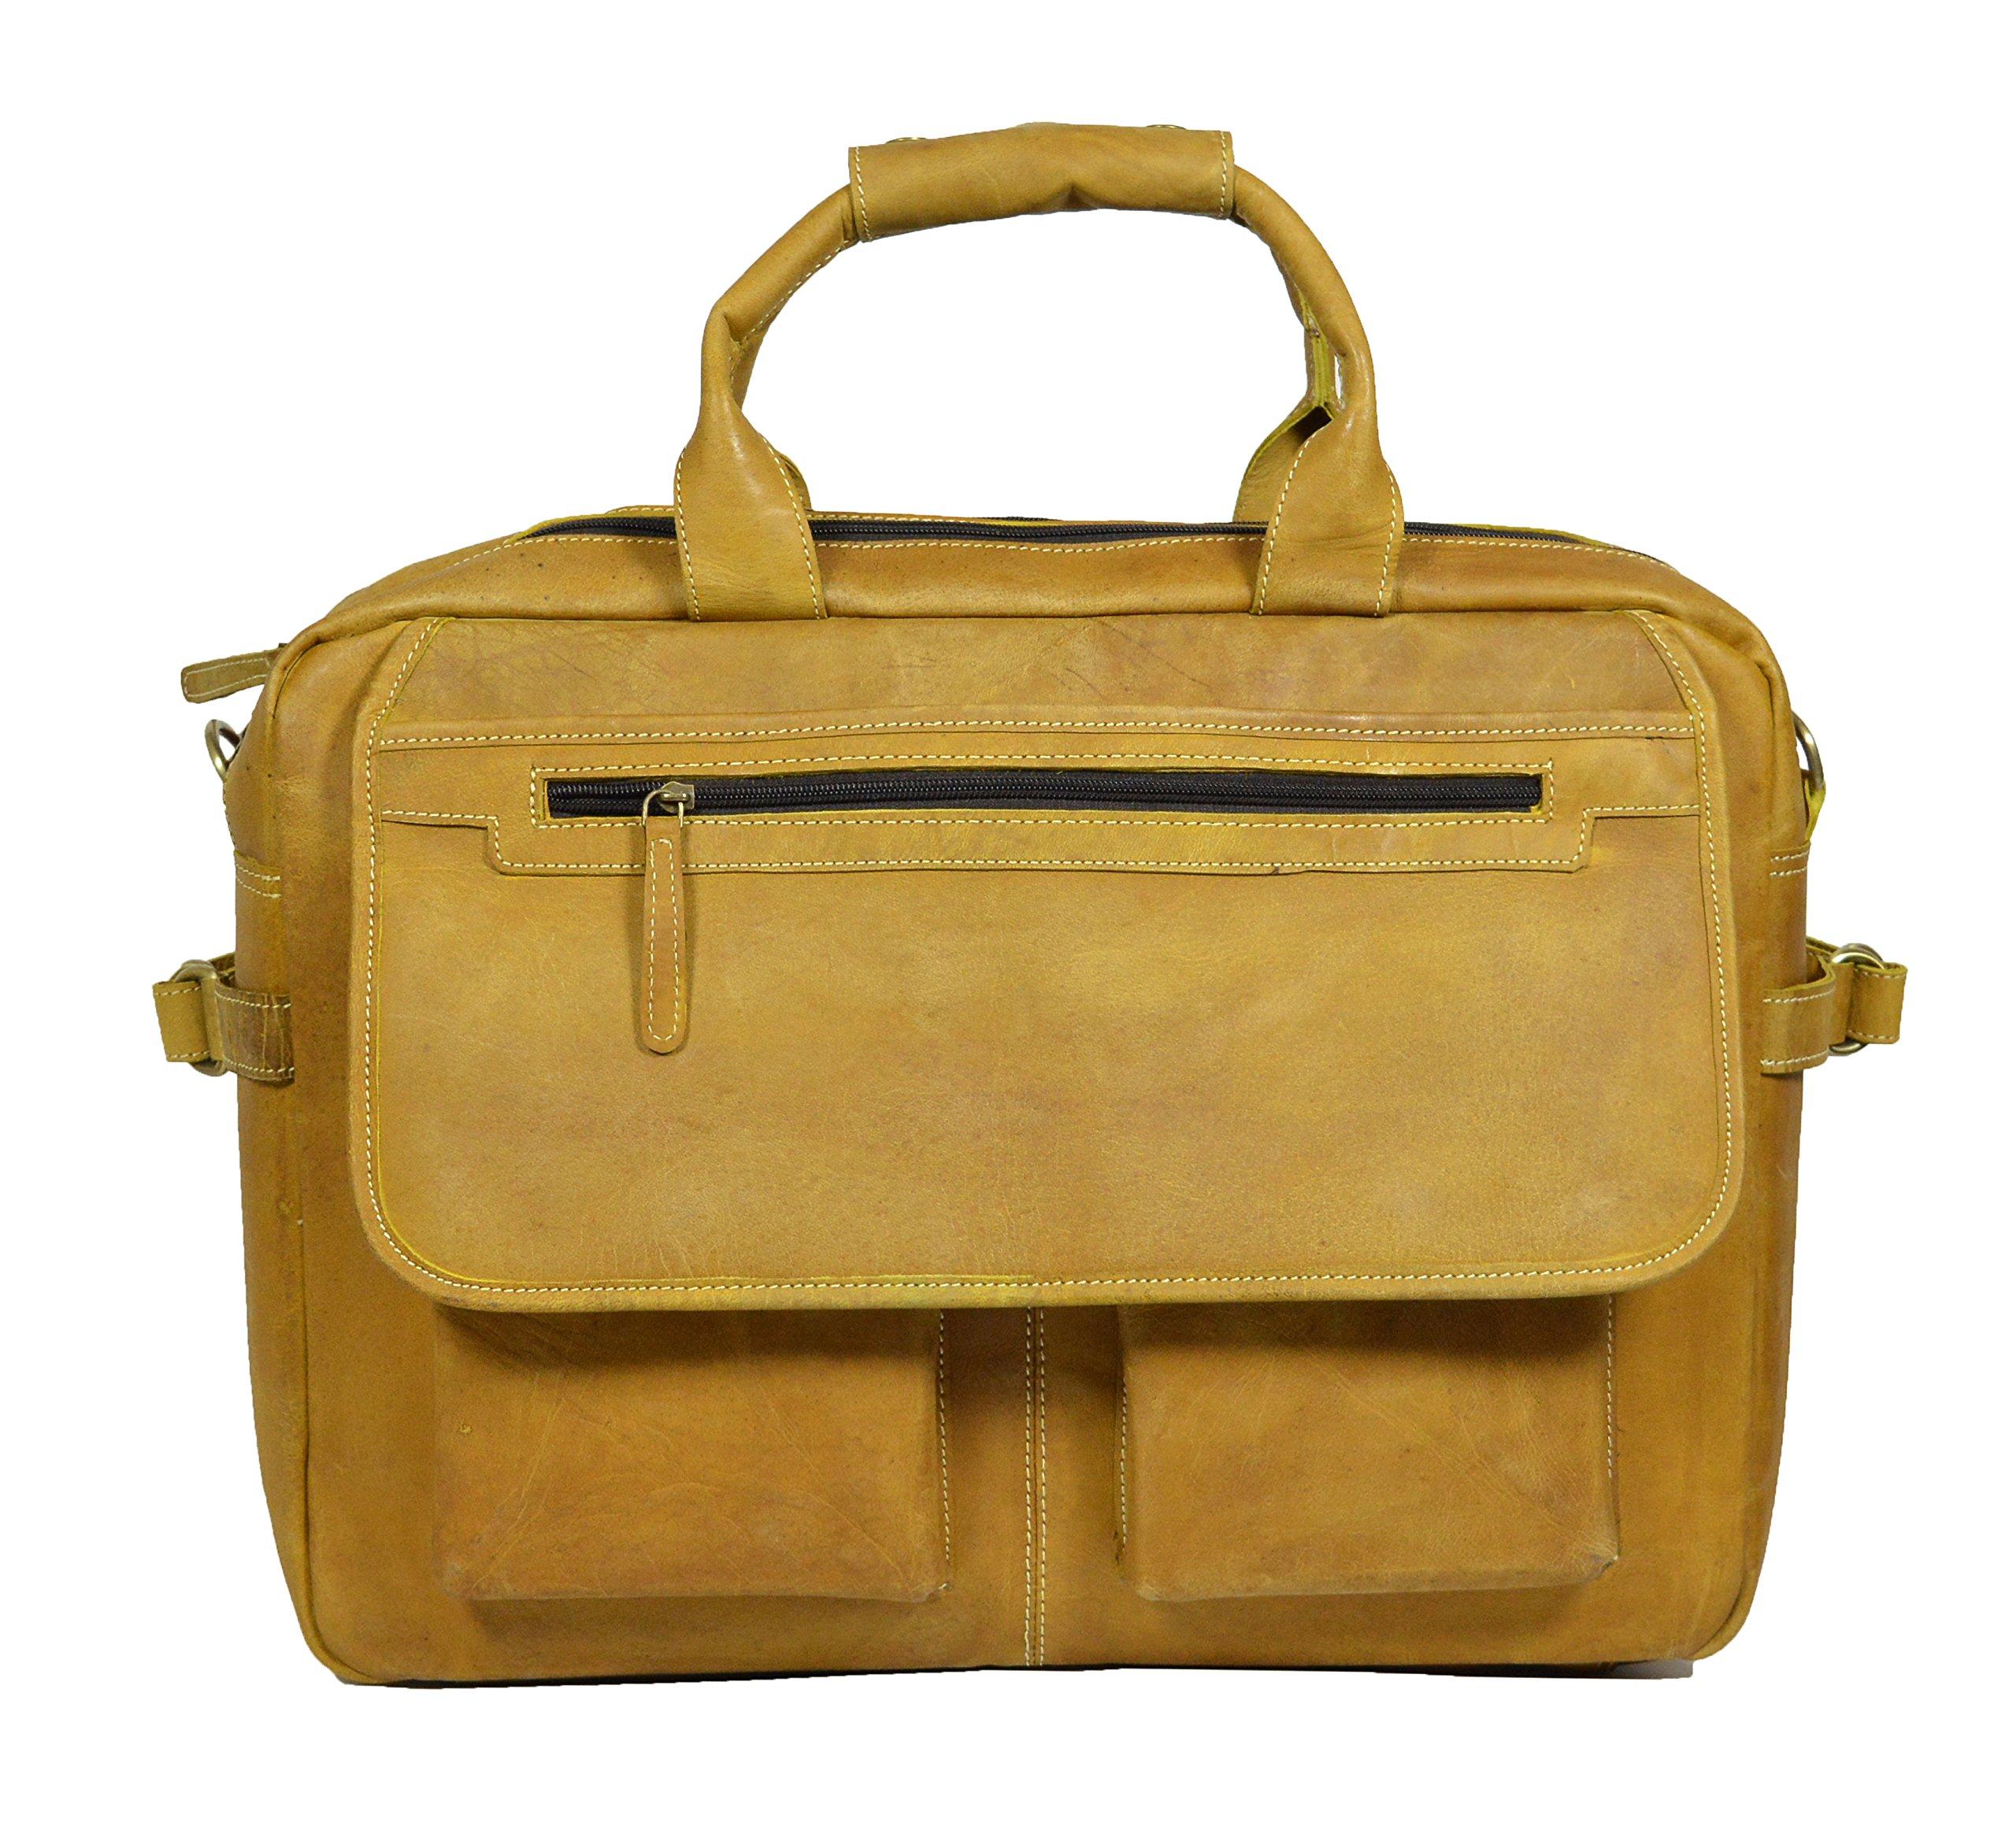 ADIMANI Vintage Crazy Horse Hunter Leather Laptop Briefcase Bag Notebook Case Travel Messenger Bag 18x13 inches